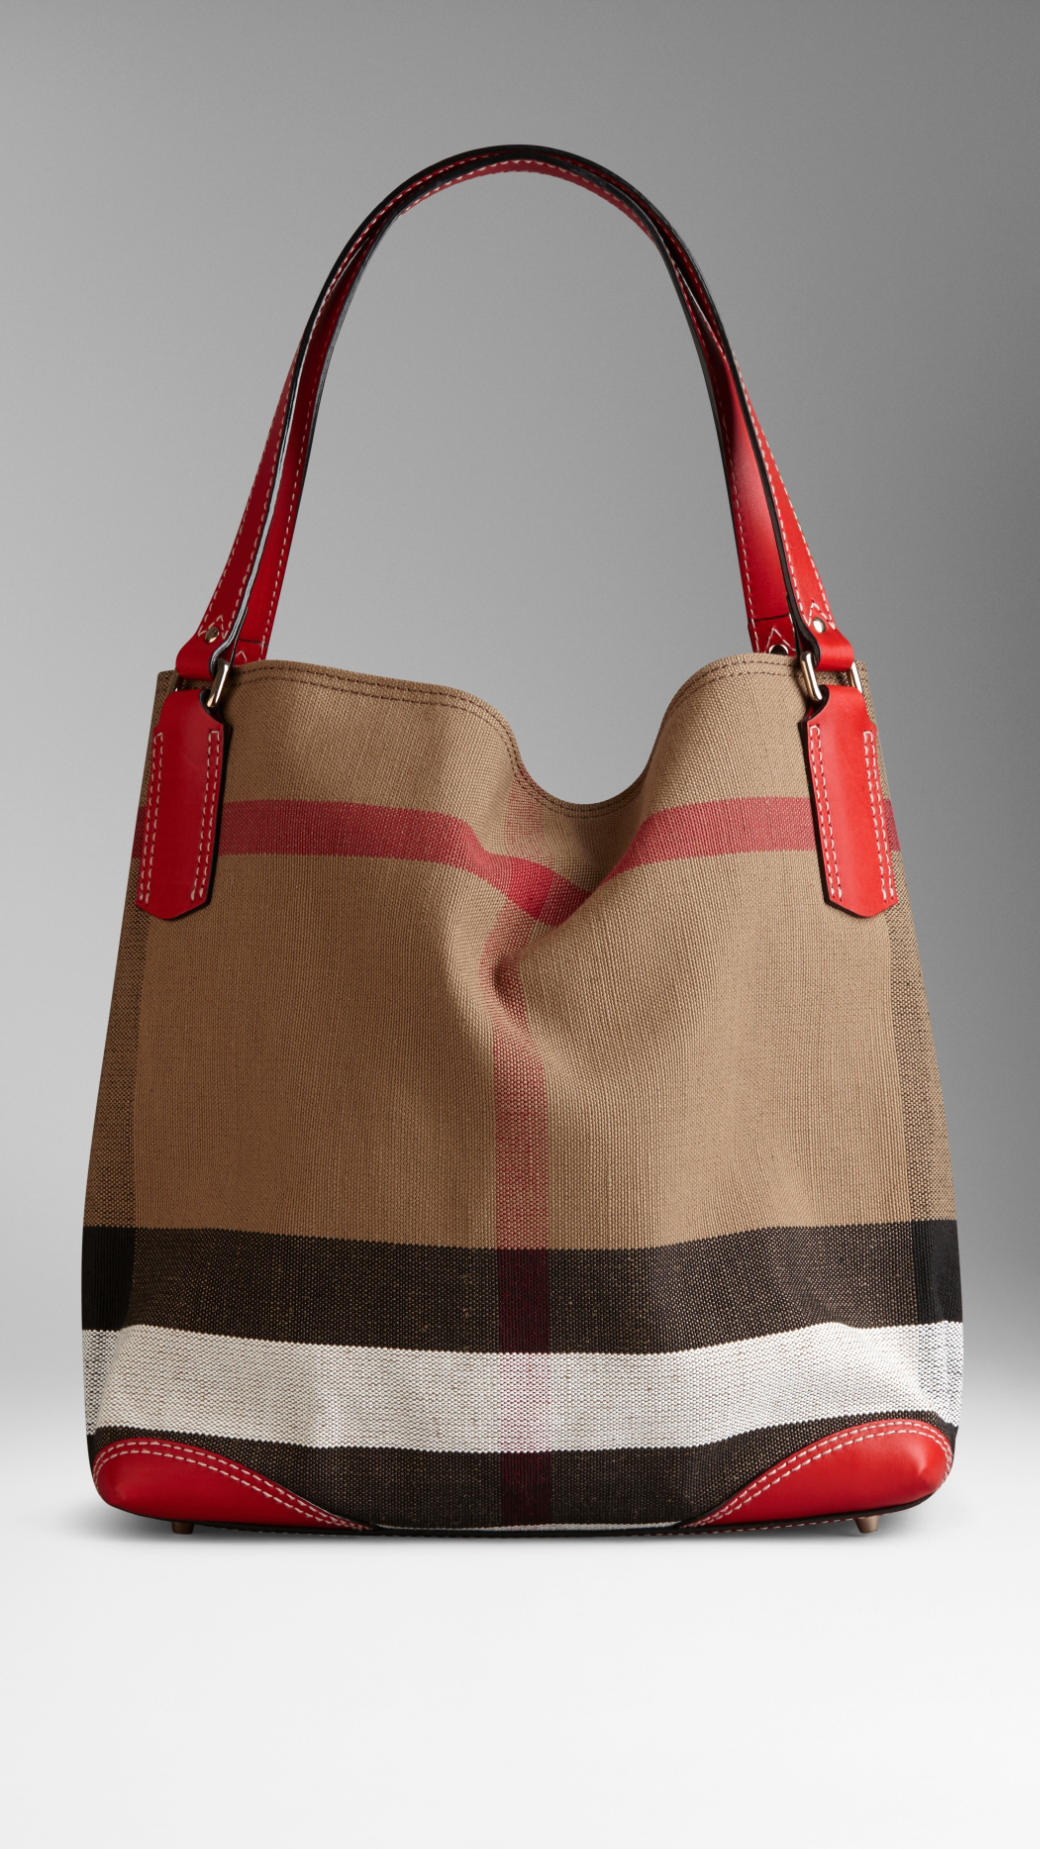 Burberry Medium Canvas Check Tote Bag In Red cadmium